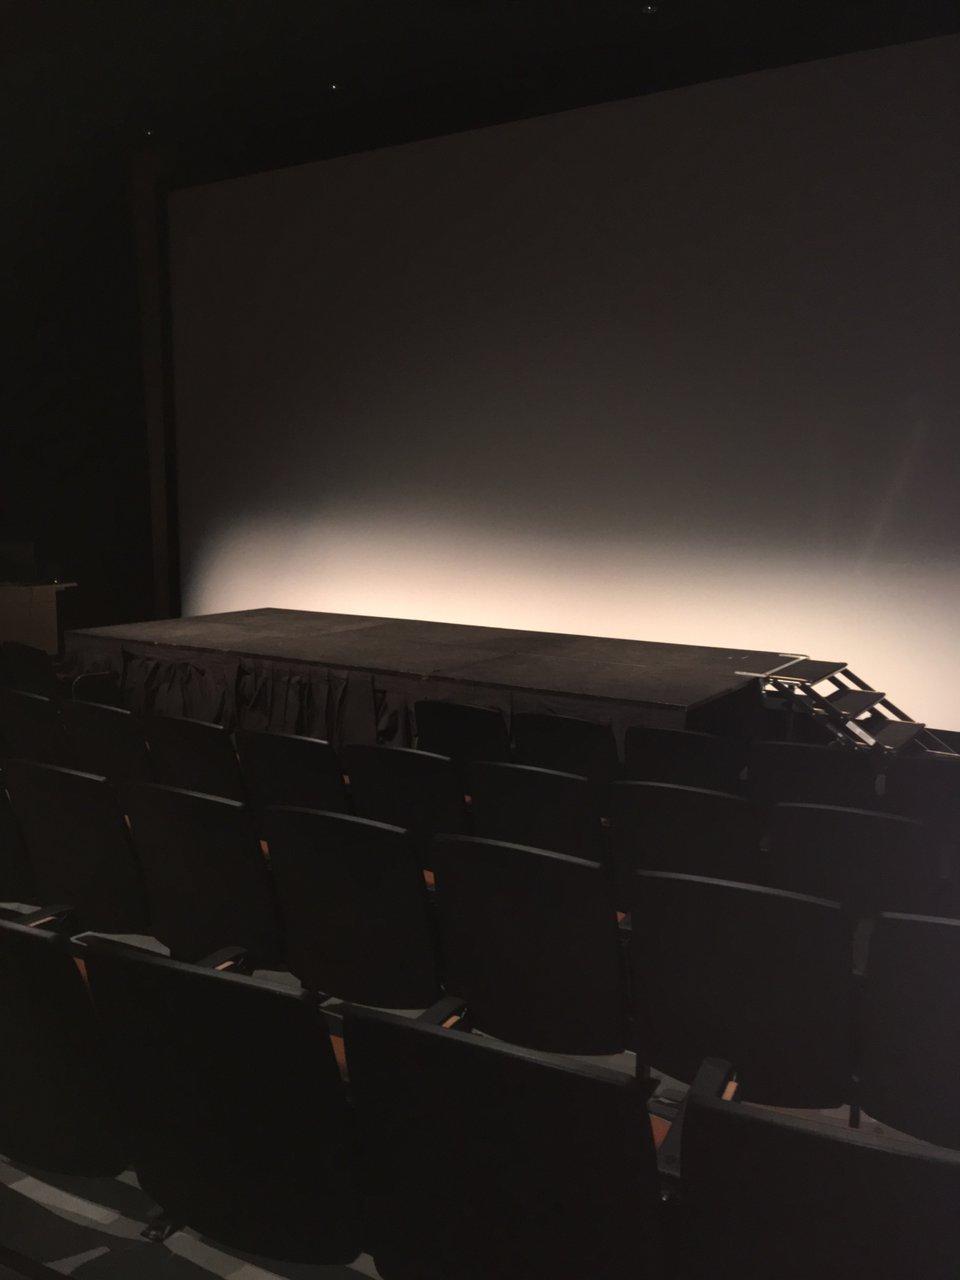 ASU Theatre Summer Play photo A18E356C-6340-4BDE-866C-6AD32E10D2DF.jpg